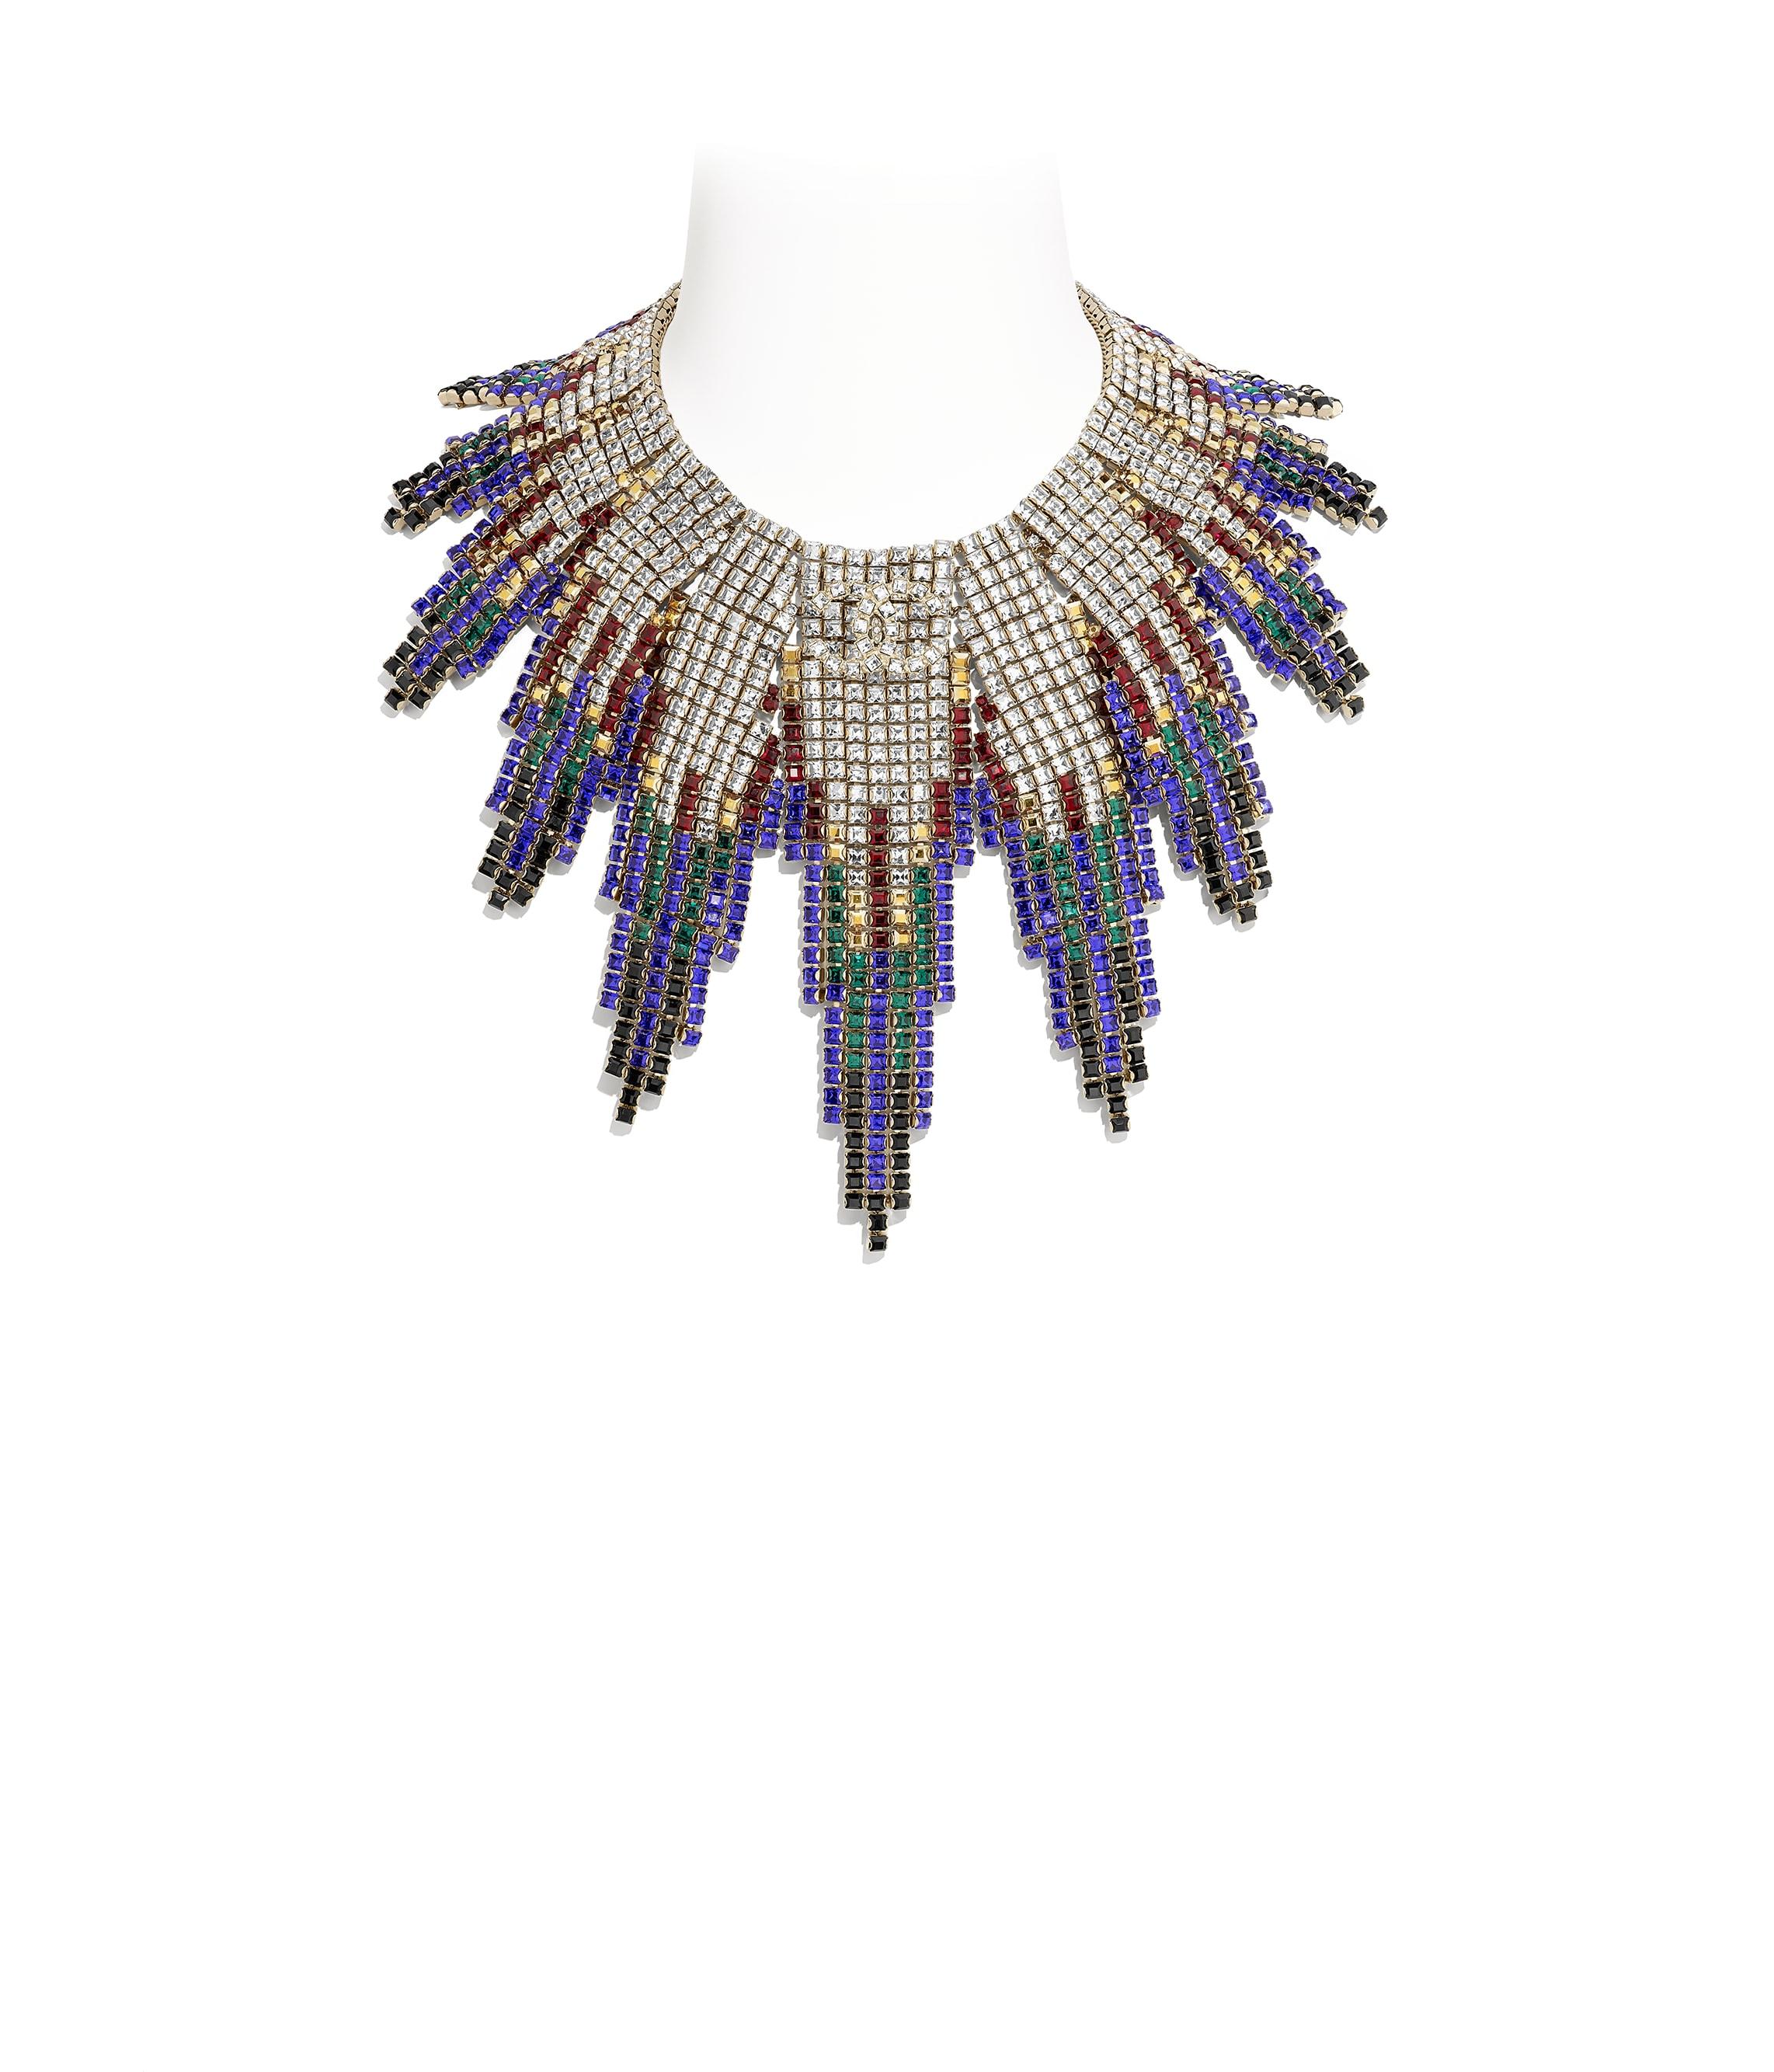 306de4d67 Costume Jewellery - CHANEL